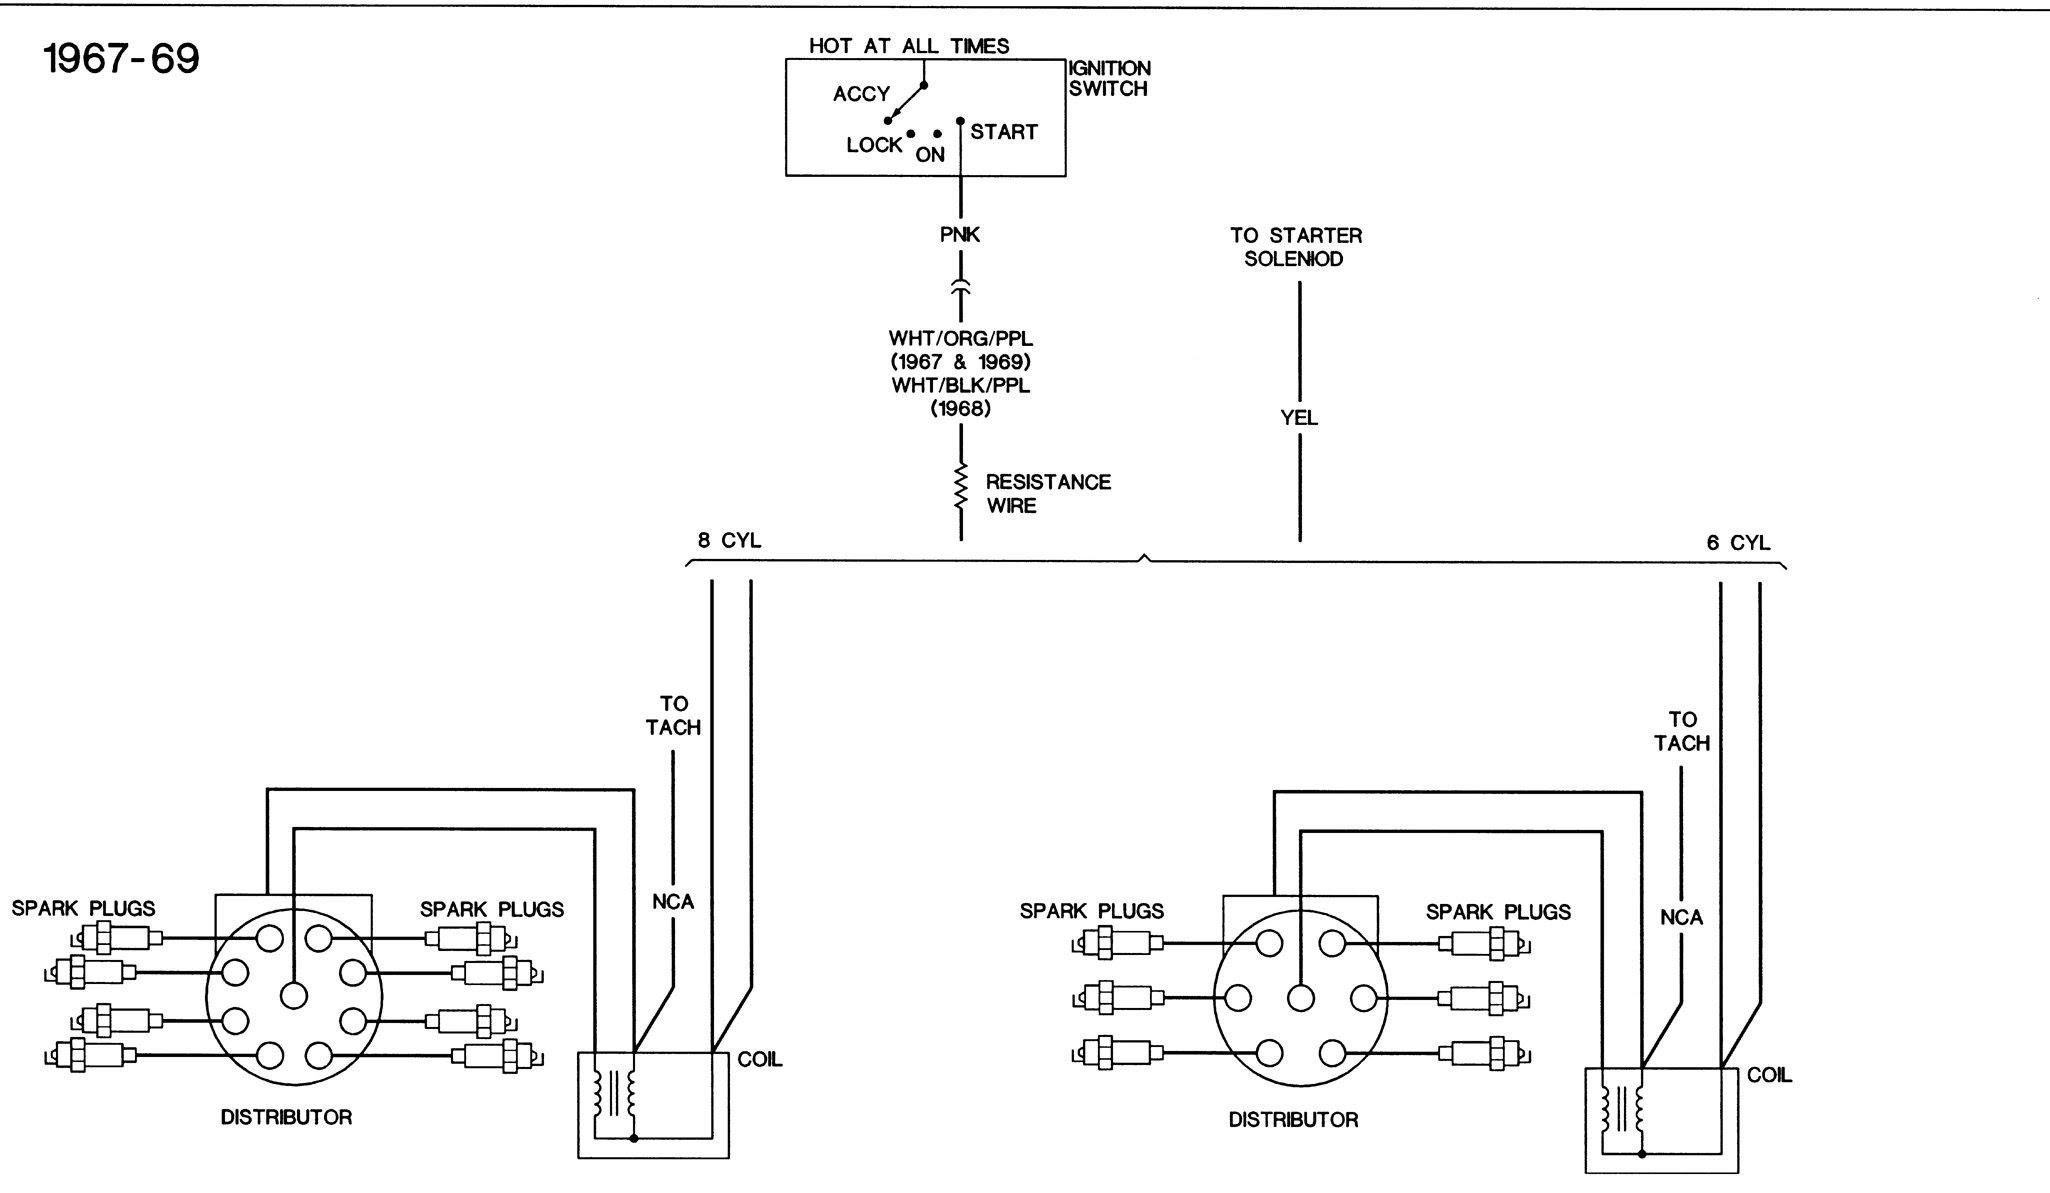 1968 camaro tach wiring - wiring diagram system list-image -  list-image.ediliadesign.it  ediliadesign.it